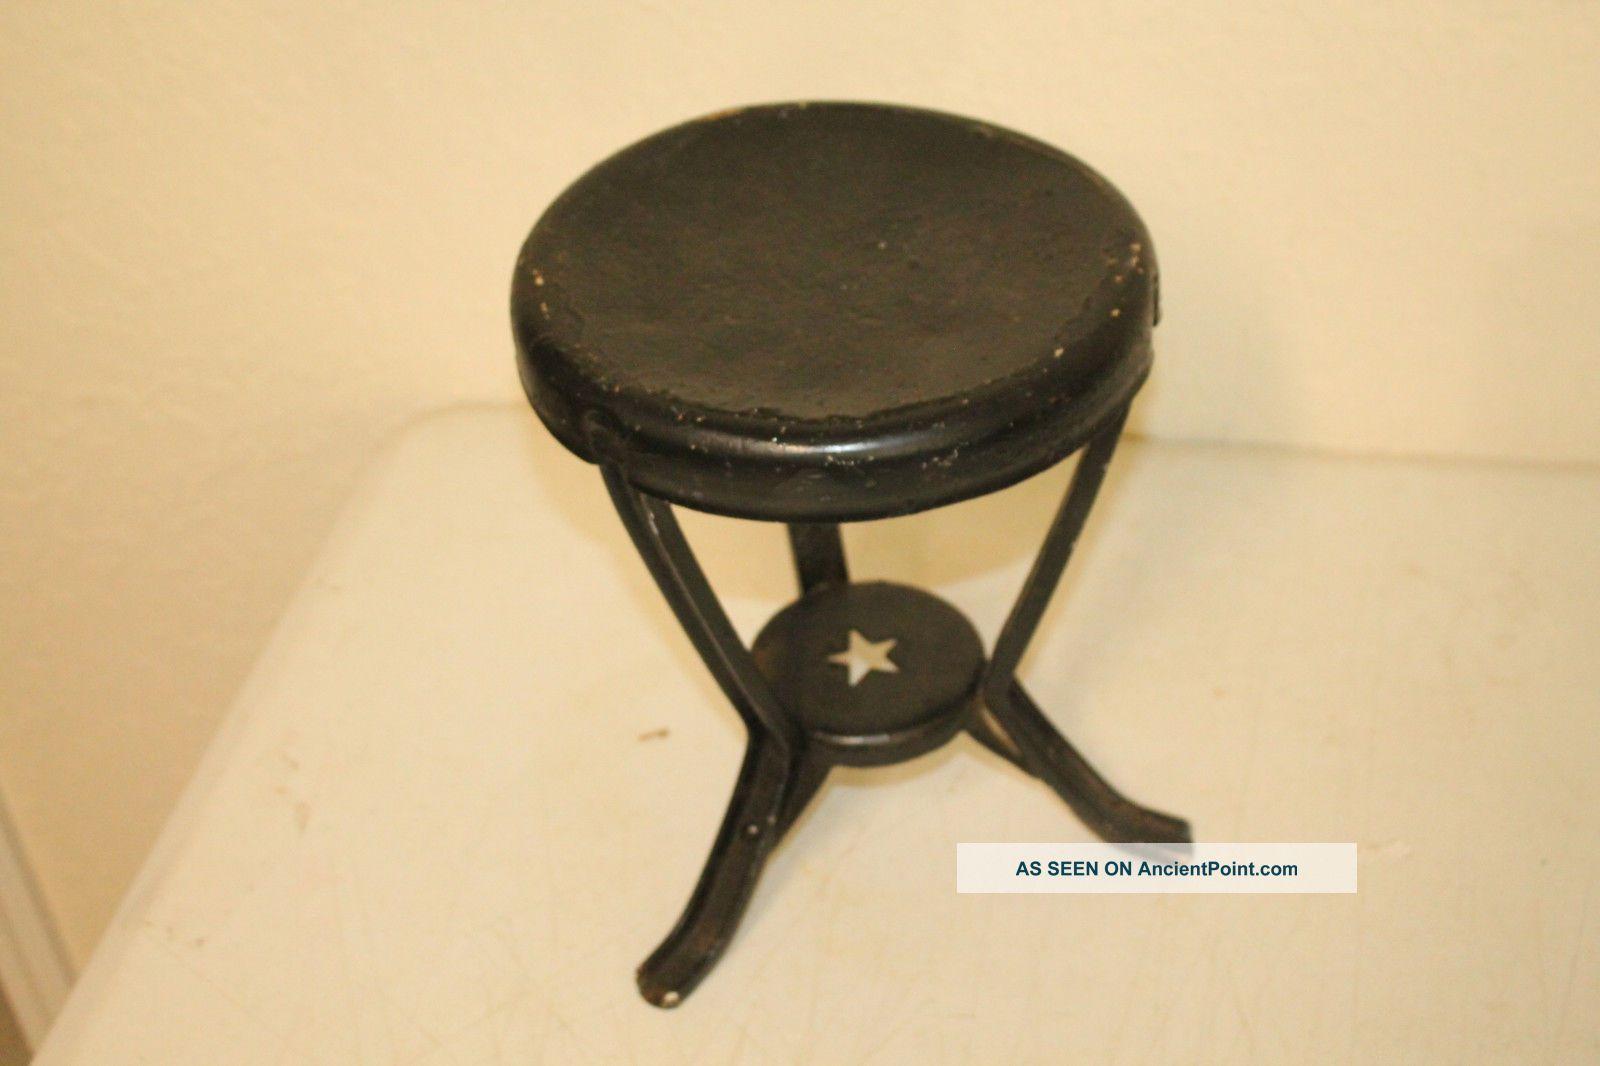 Antique Orignial Iron Metal Primitive Star Milking Stool 3 Legged Farm Tool 1900-1950 photo